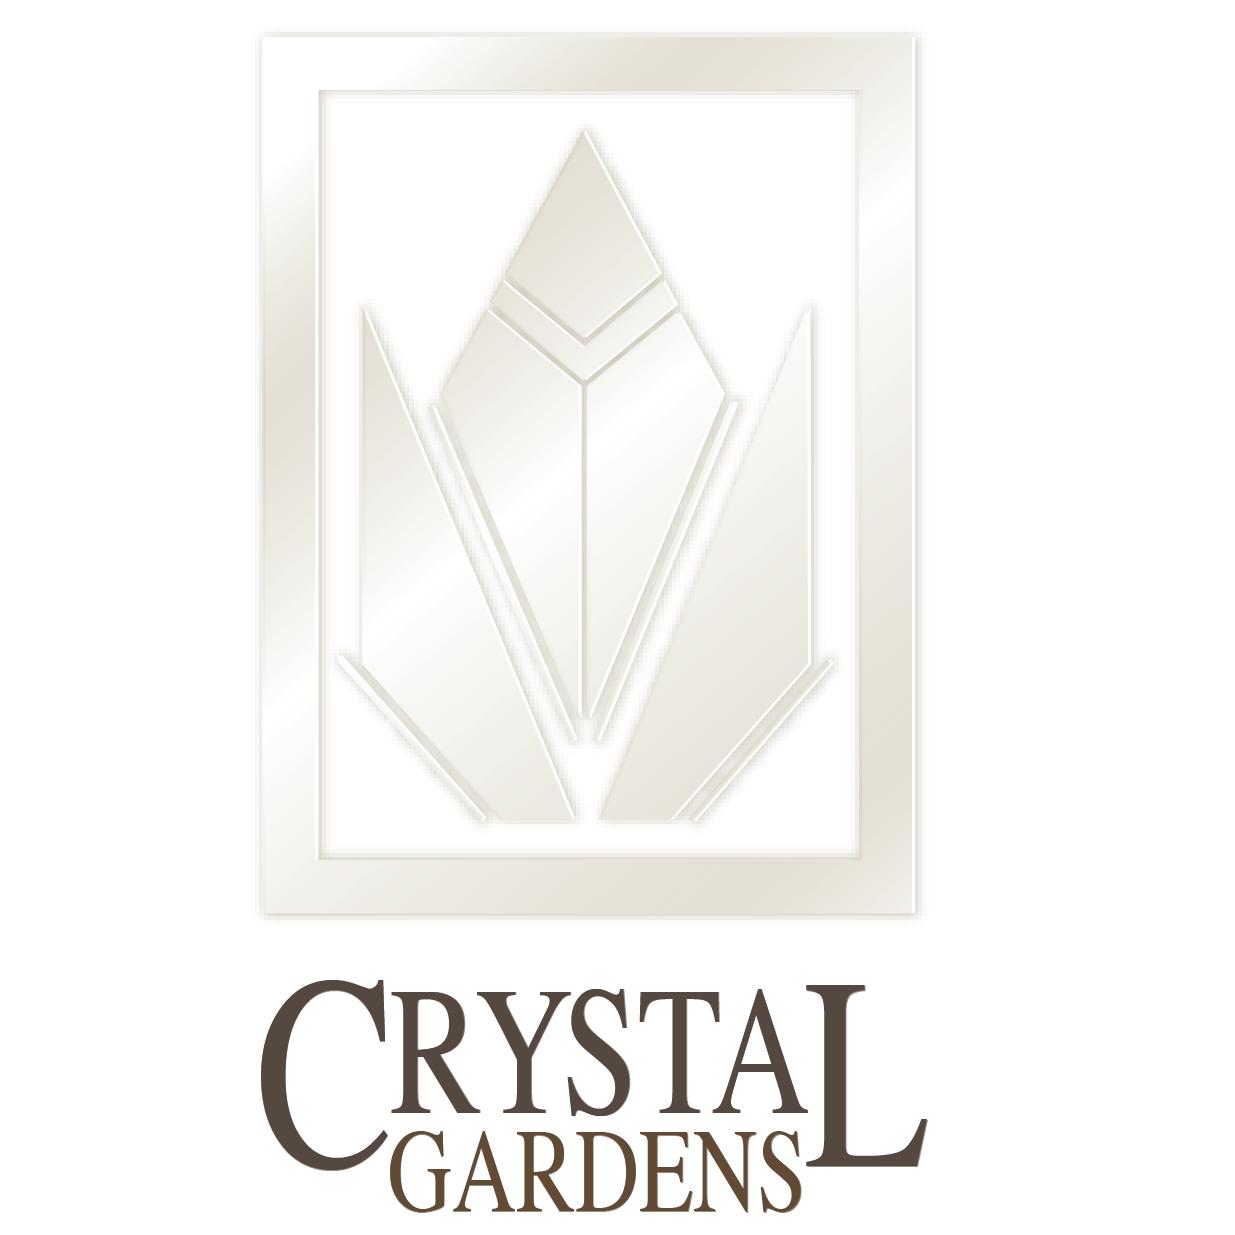 Crystal Gardens Banquet Center - Howell, MI - Banquet Facilities